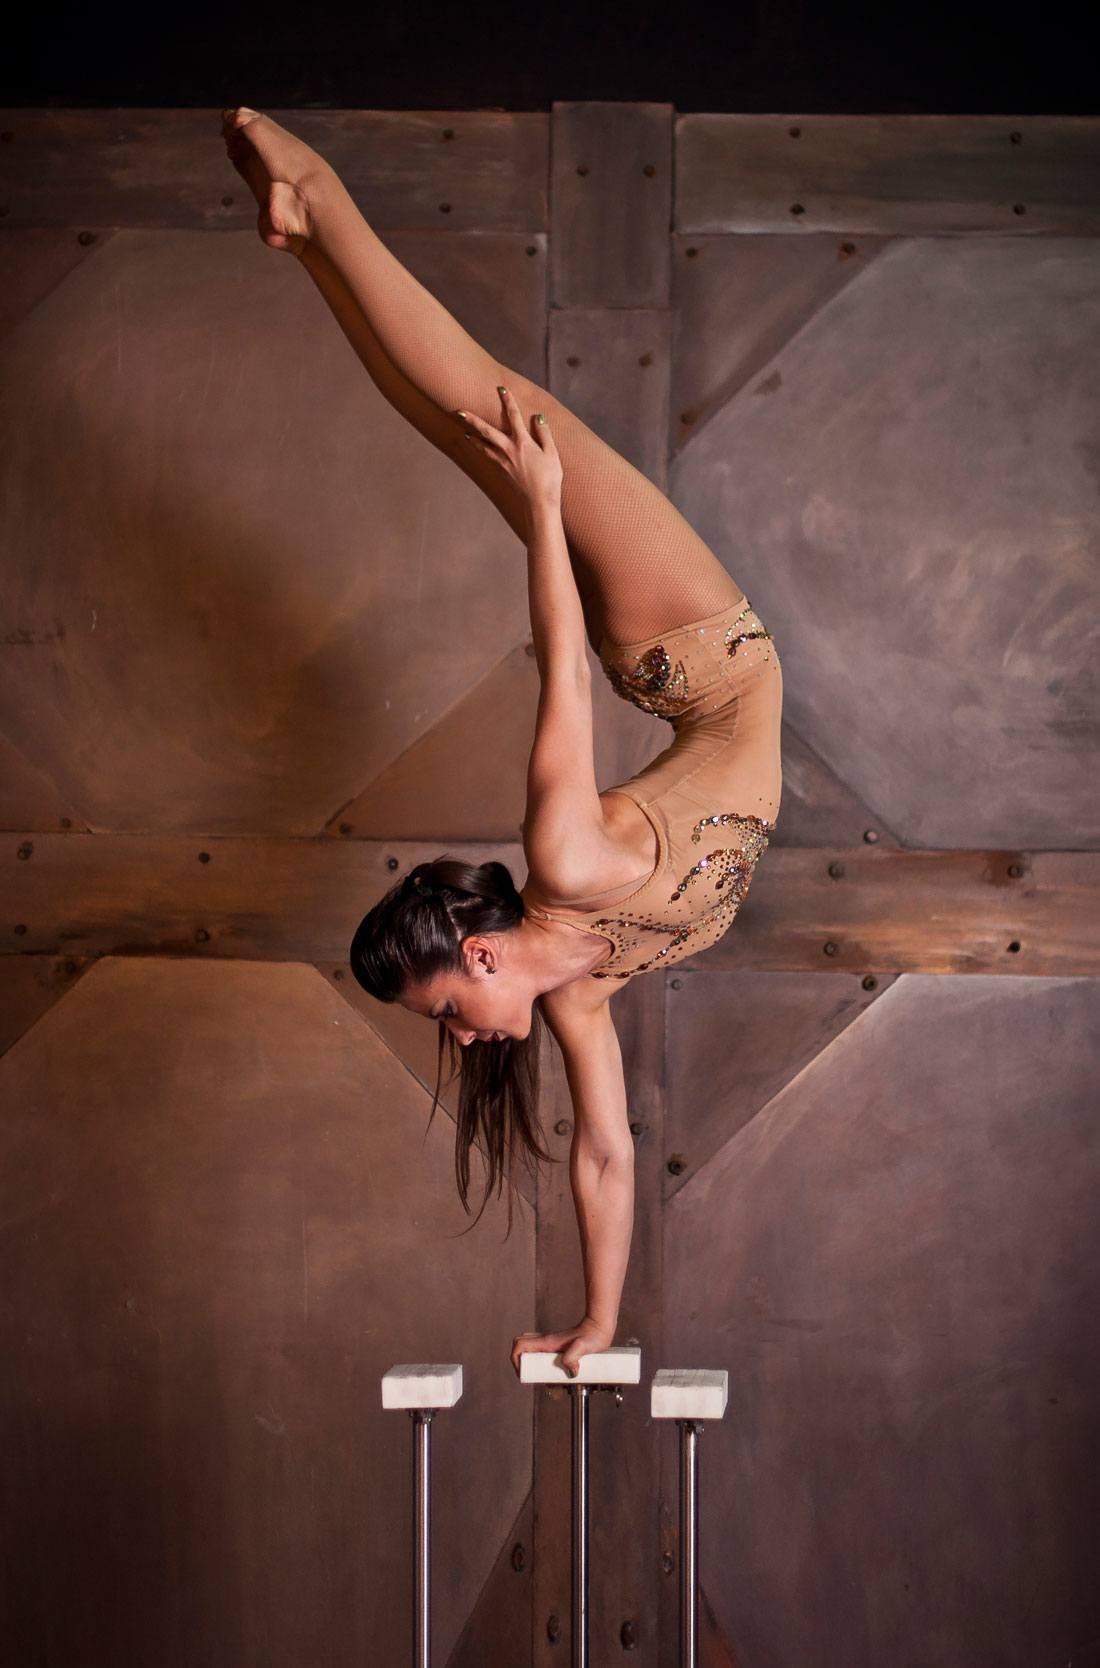 Rimma Griadunova equilibrist